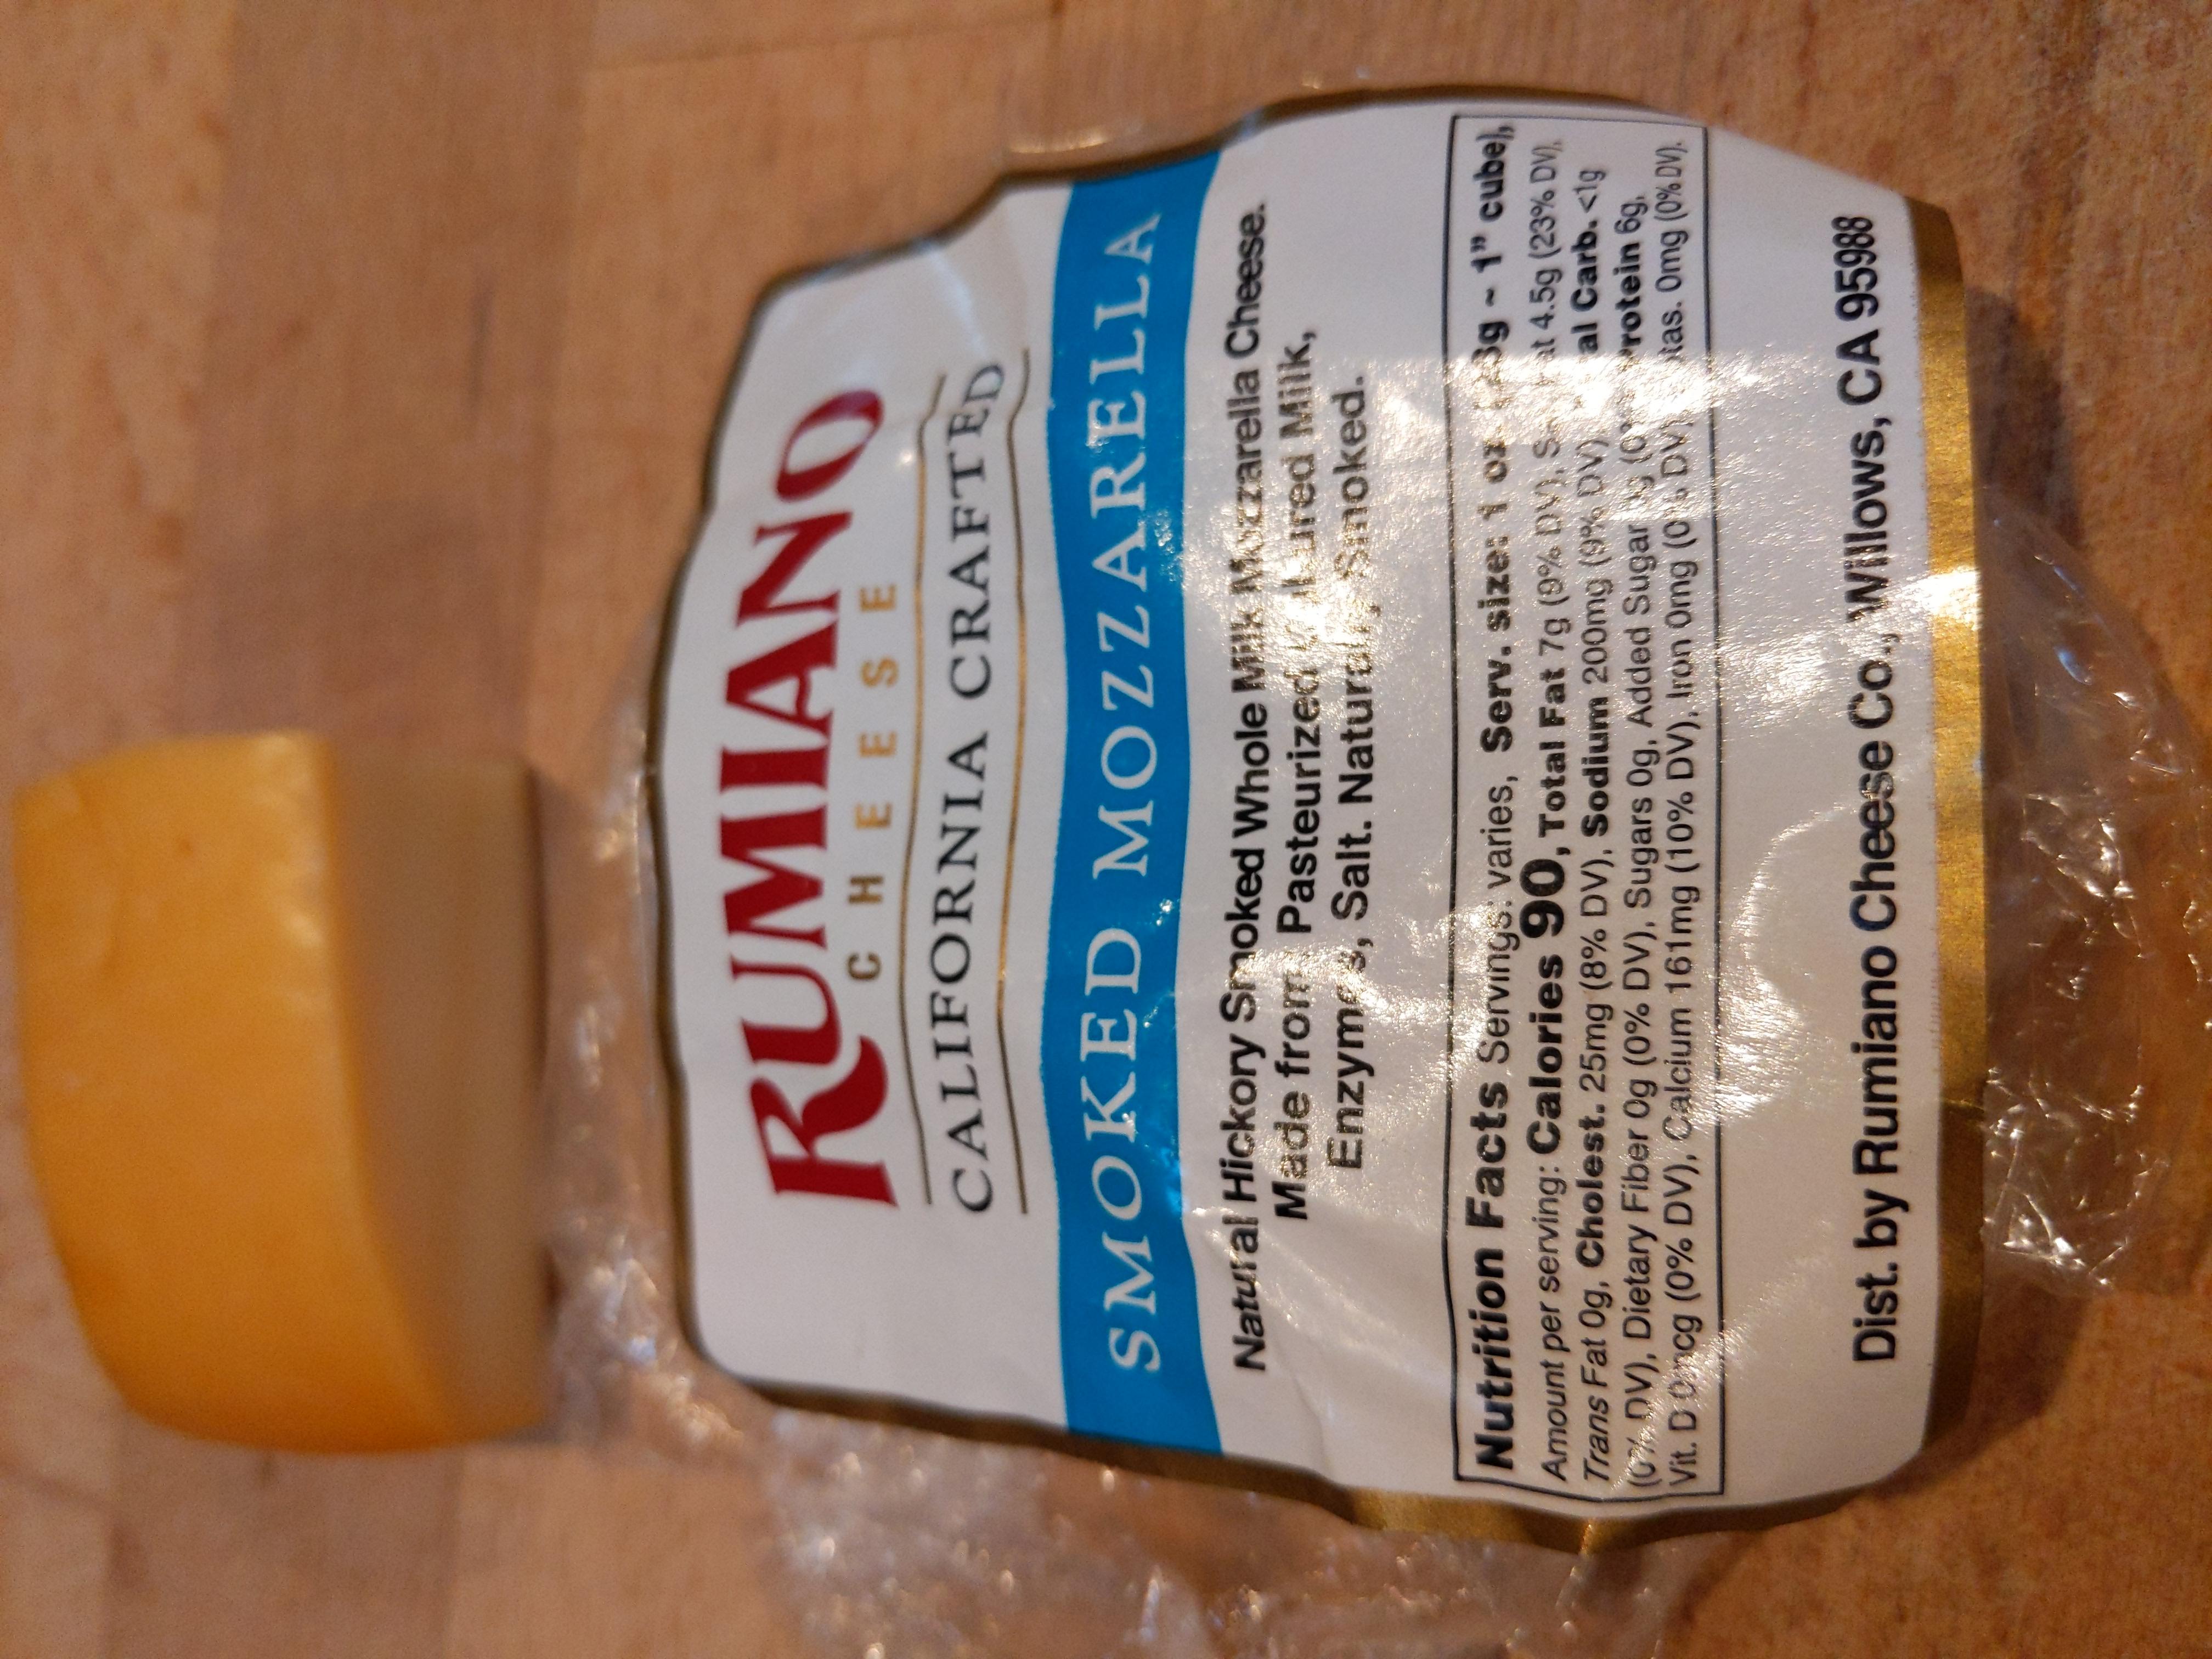 Rumiano Smoked Mozzarella